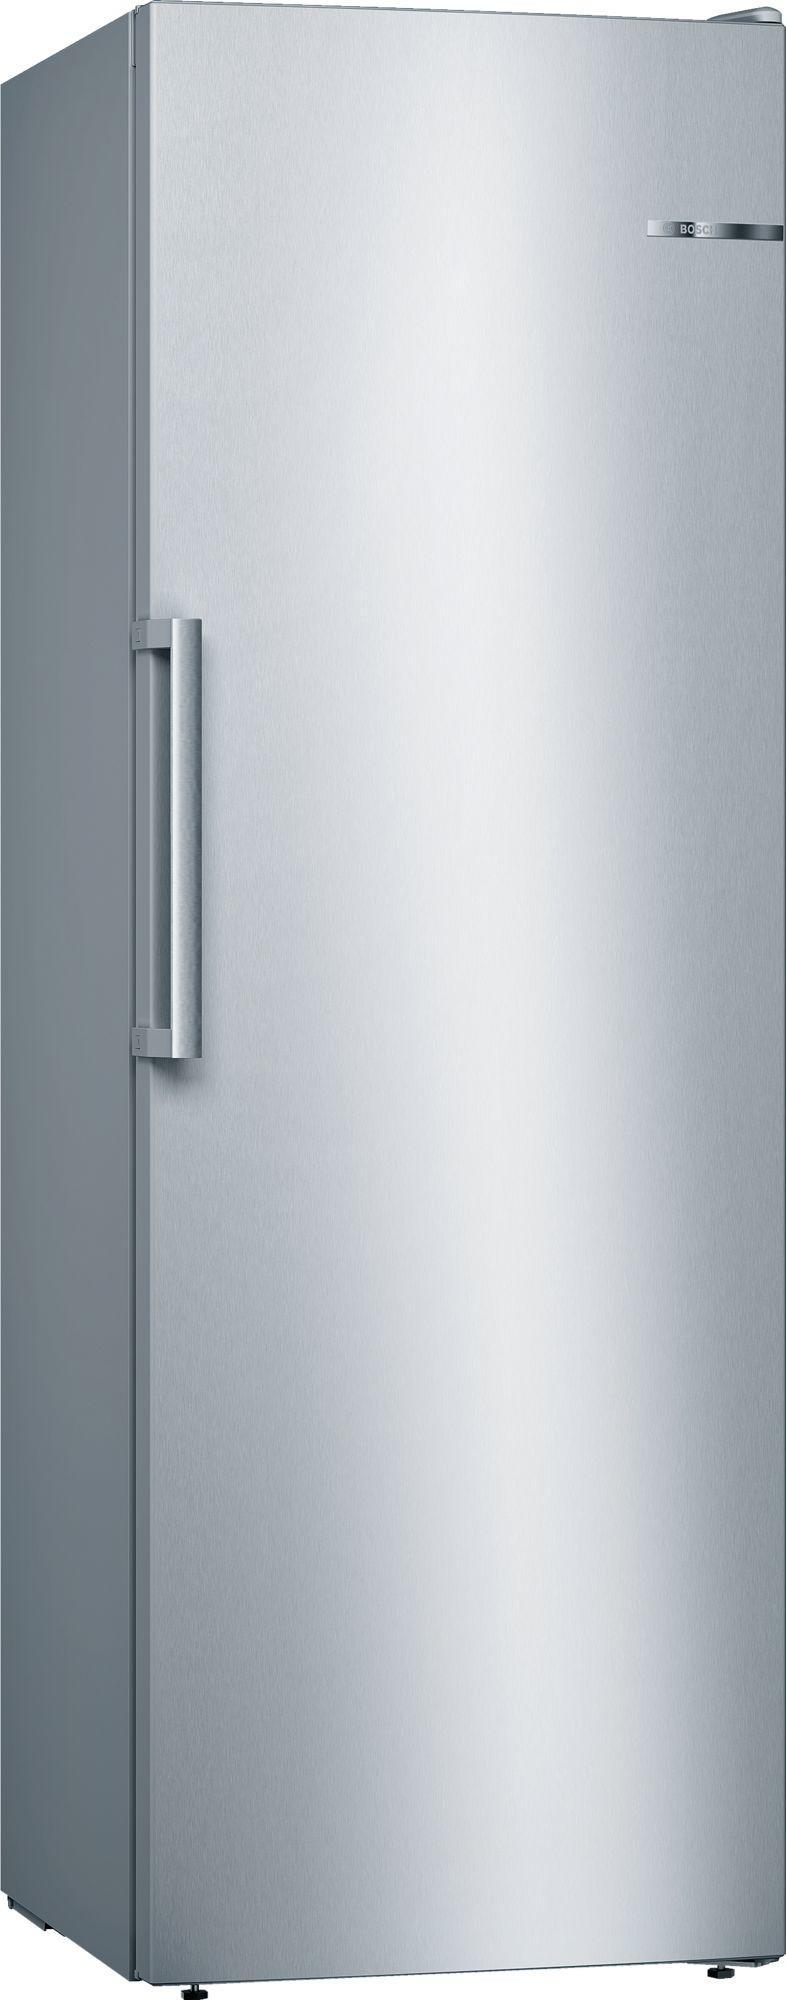 Image of Serie 4 GSN33VLEP 60cm 225 Litre Frost Free Single Door Freezer   Silver Innox